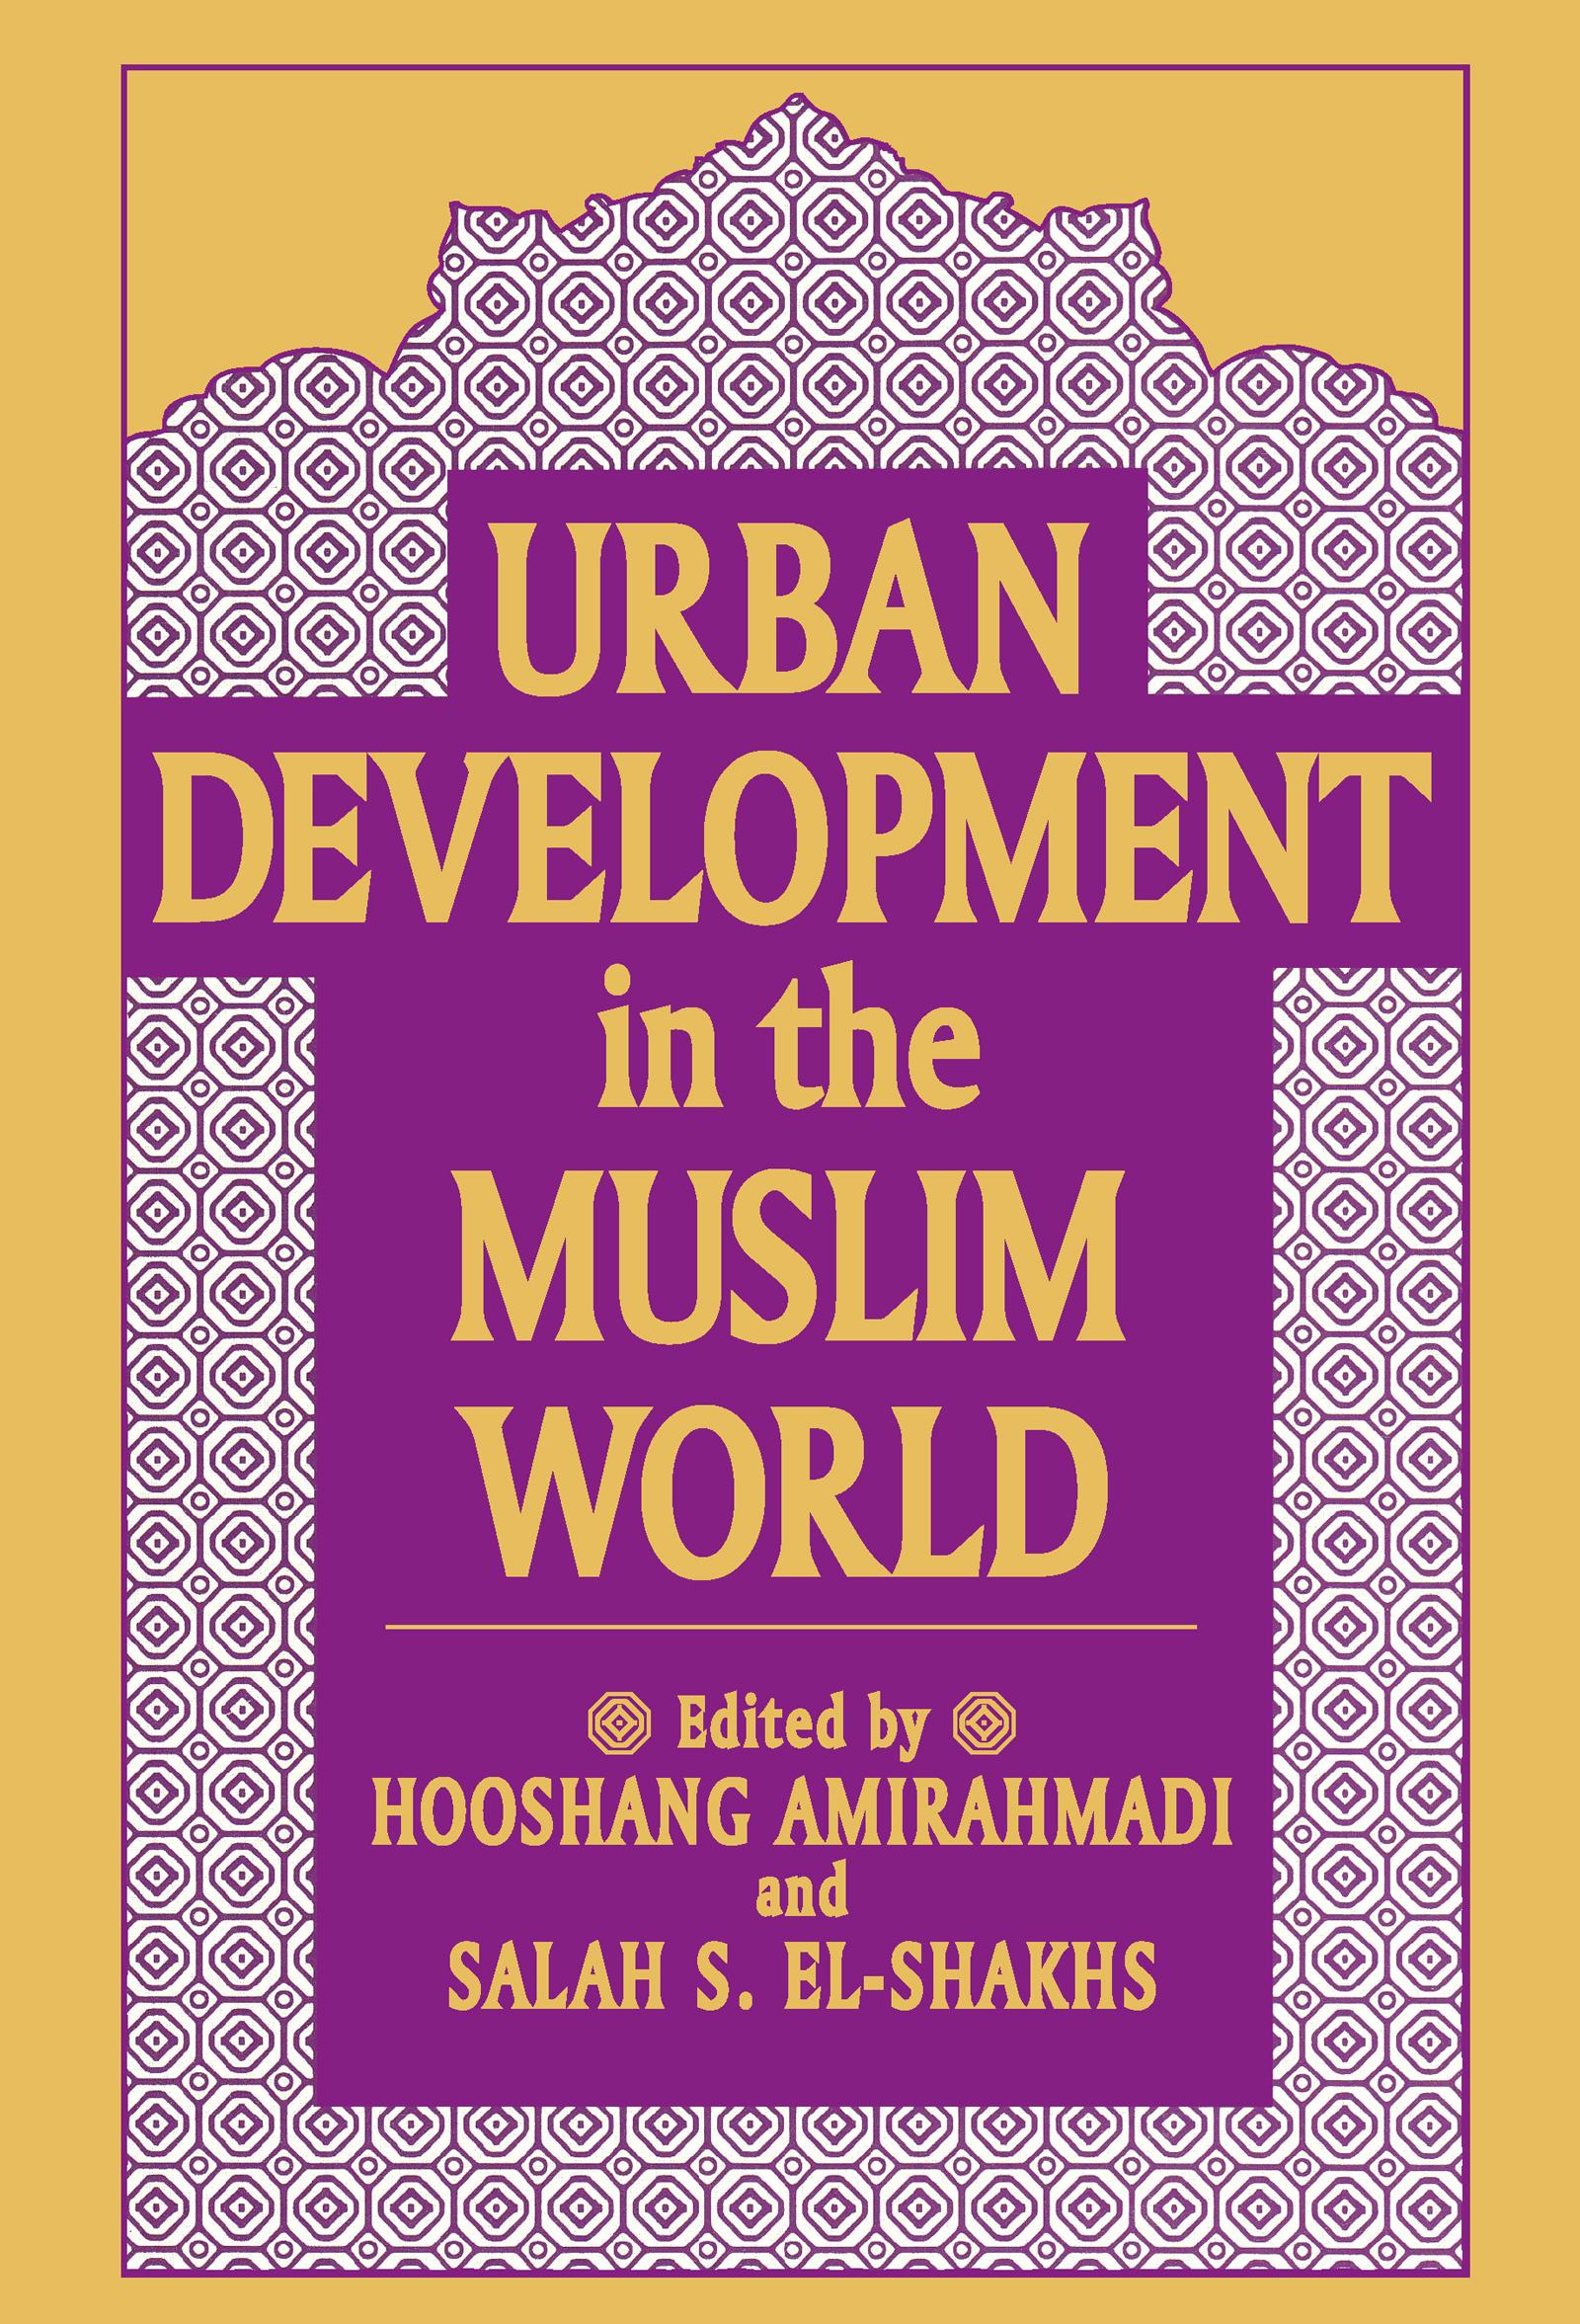 Urban Development in the Muslim World